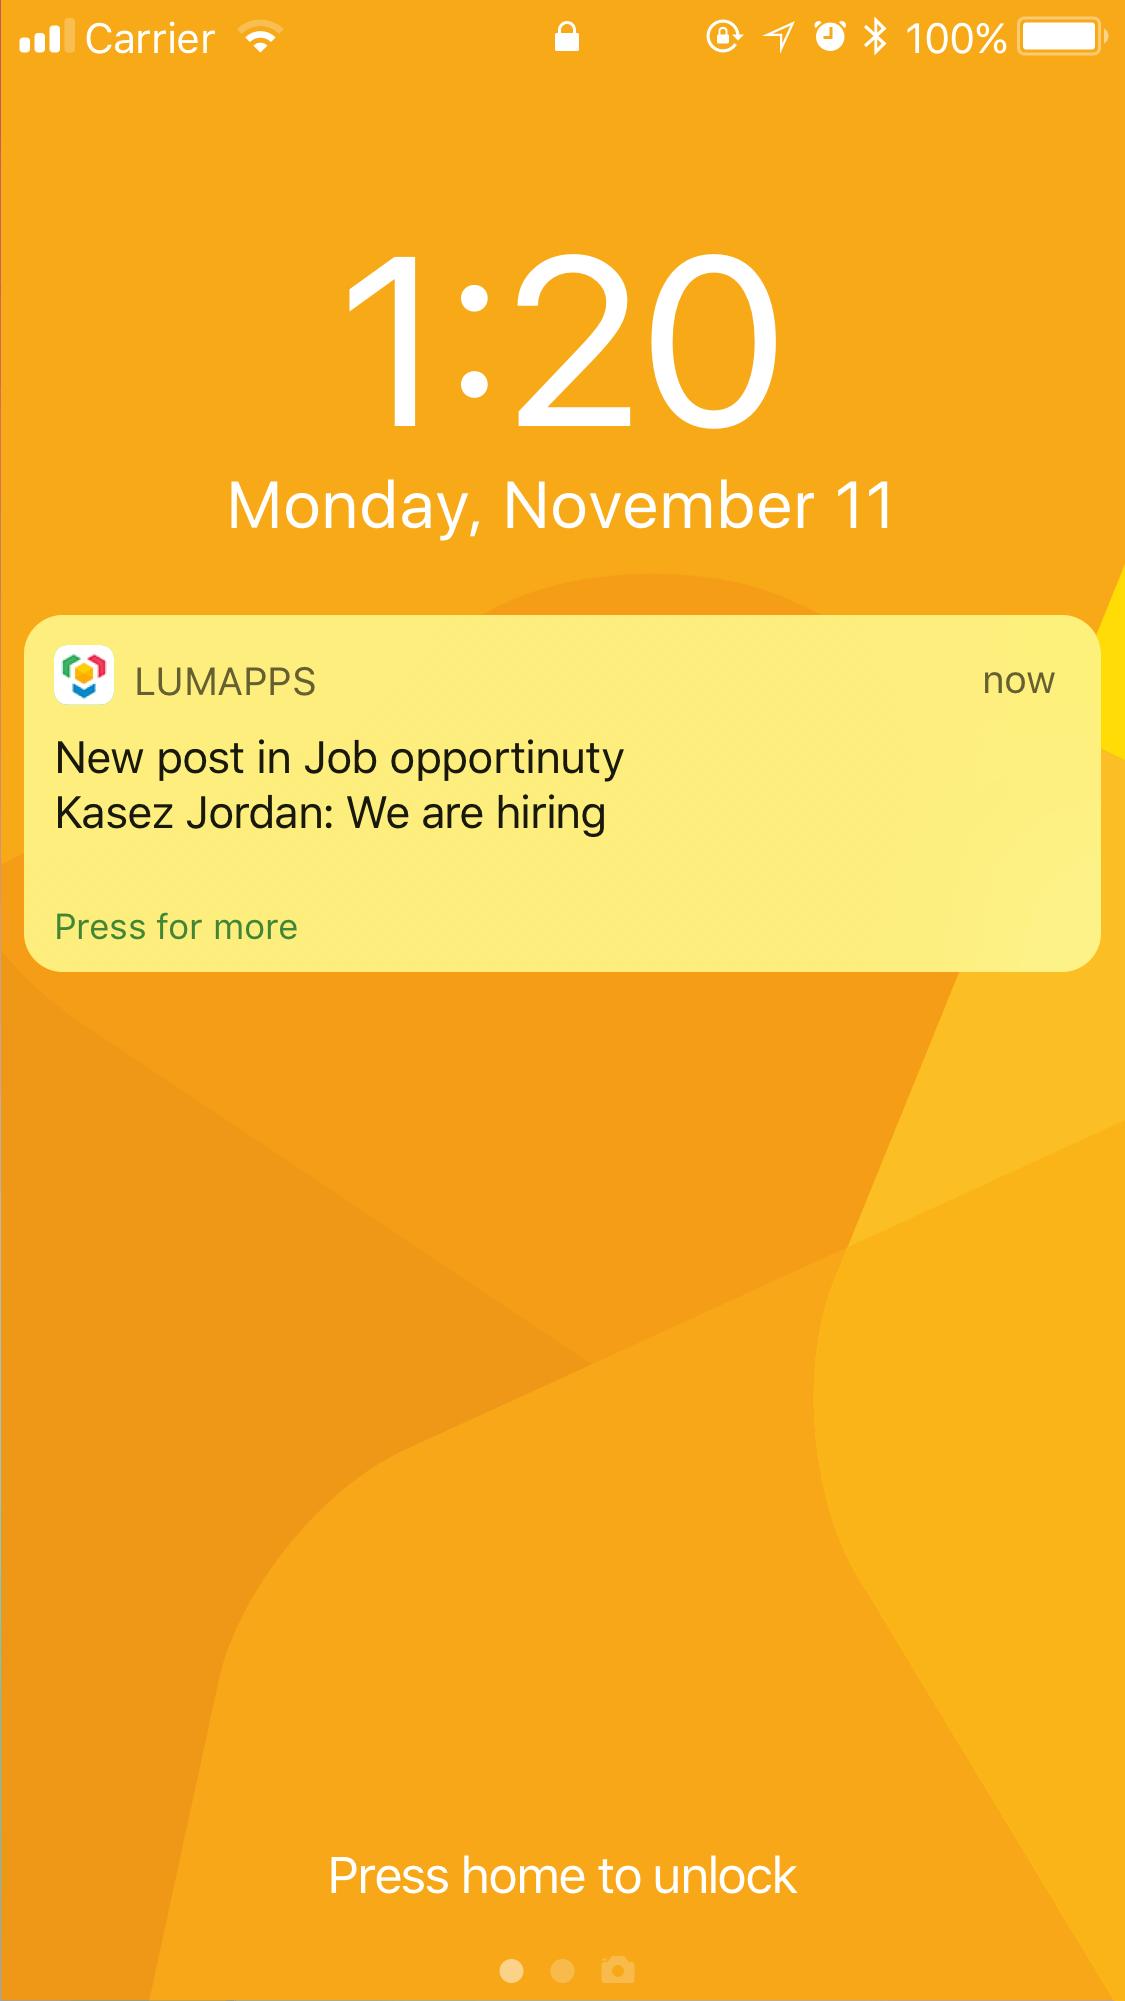 notification on locked screen iOS